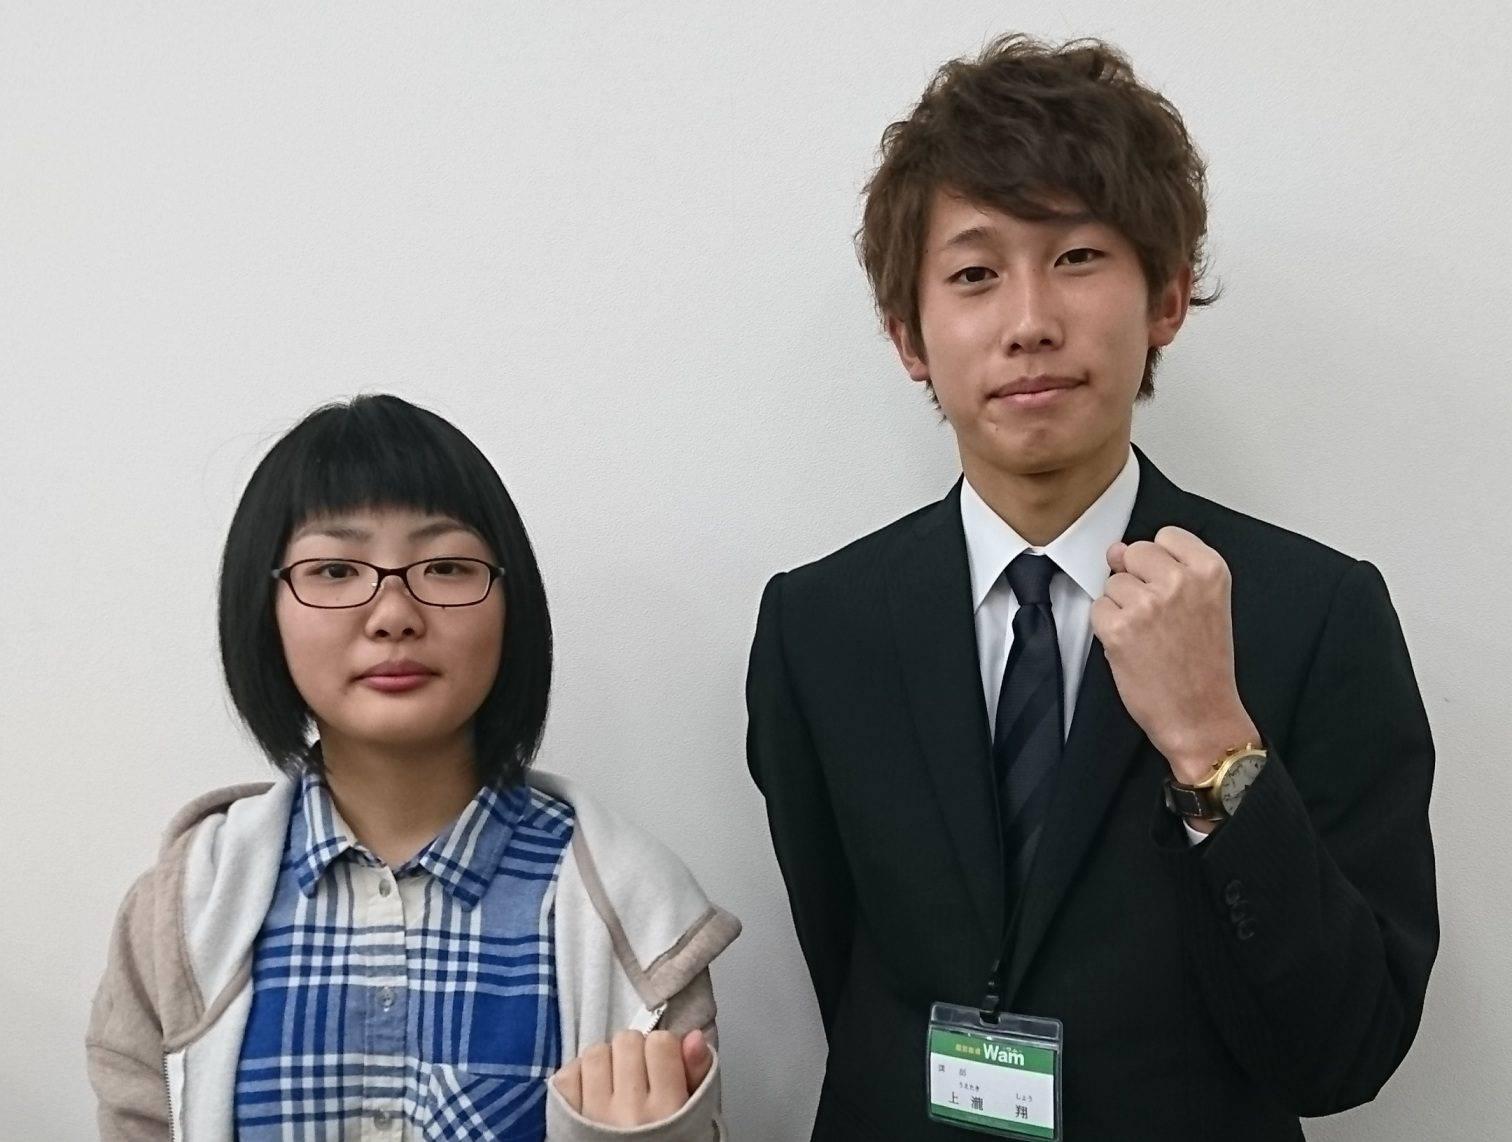 H29春 中学1年 榊原麗々さん 上滝先生